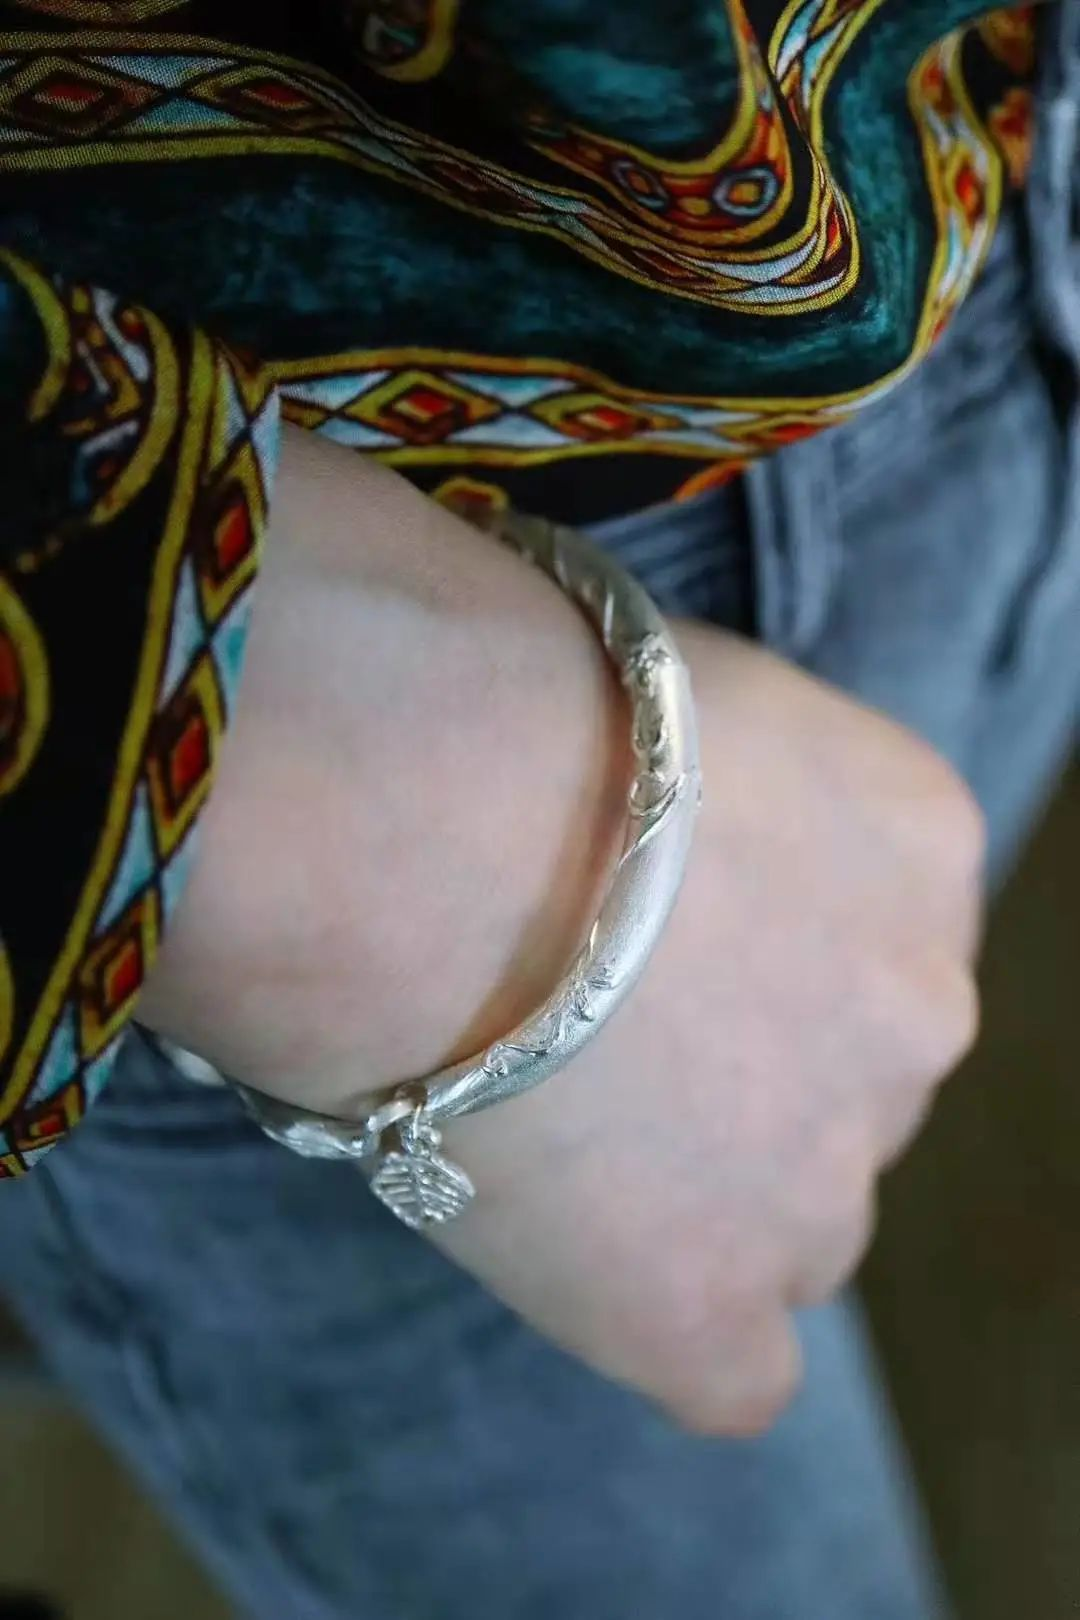 resize,m fill,h 1620,w 1080 - 为什么人们喜欢戴手镯?如何挑选一款适合自己的手镯?